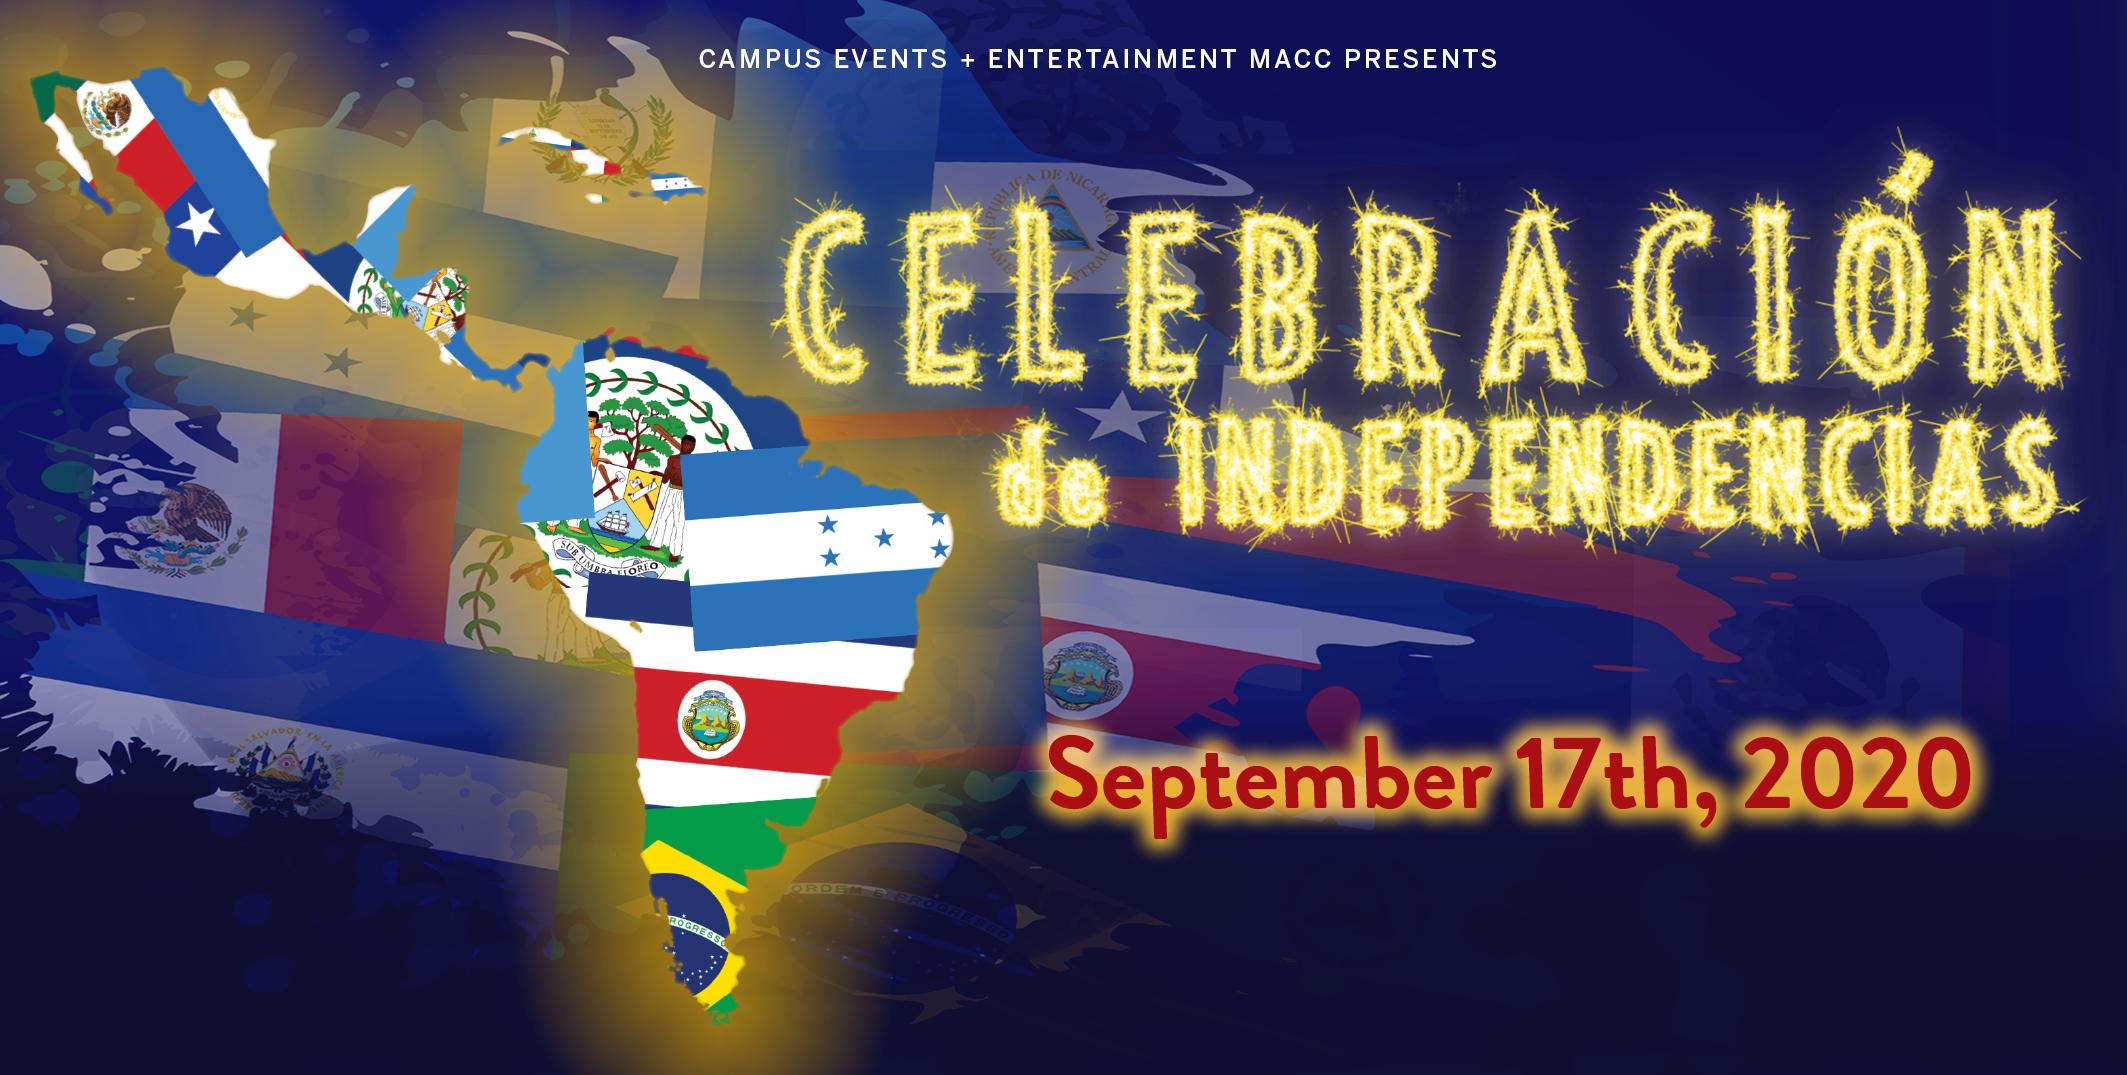 Celebracion will be on September 17 7 pm